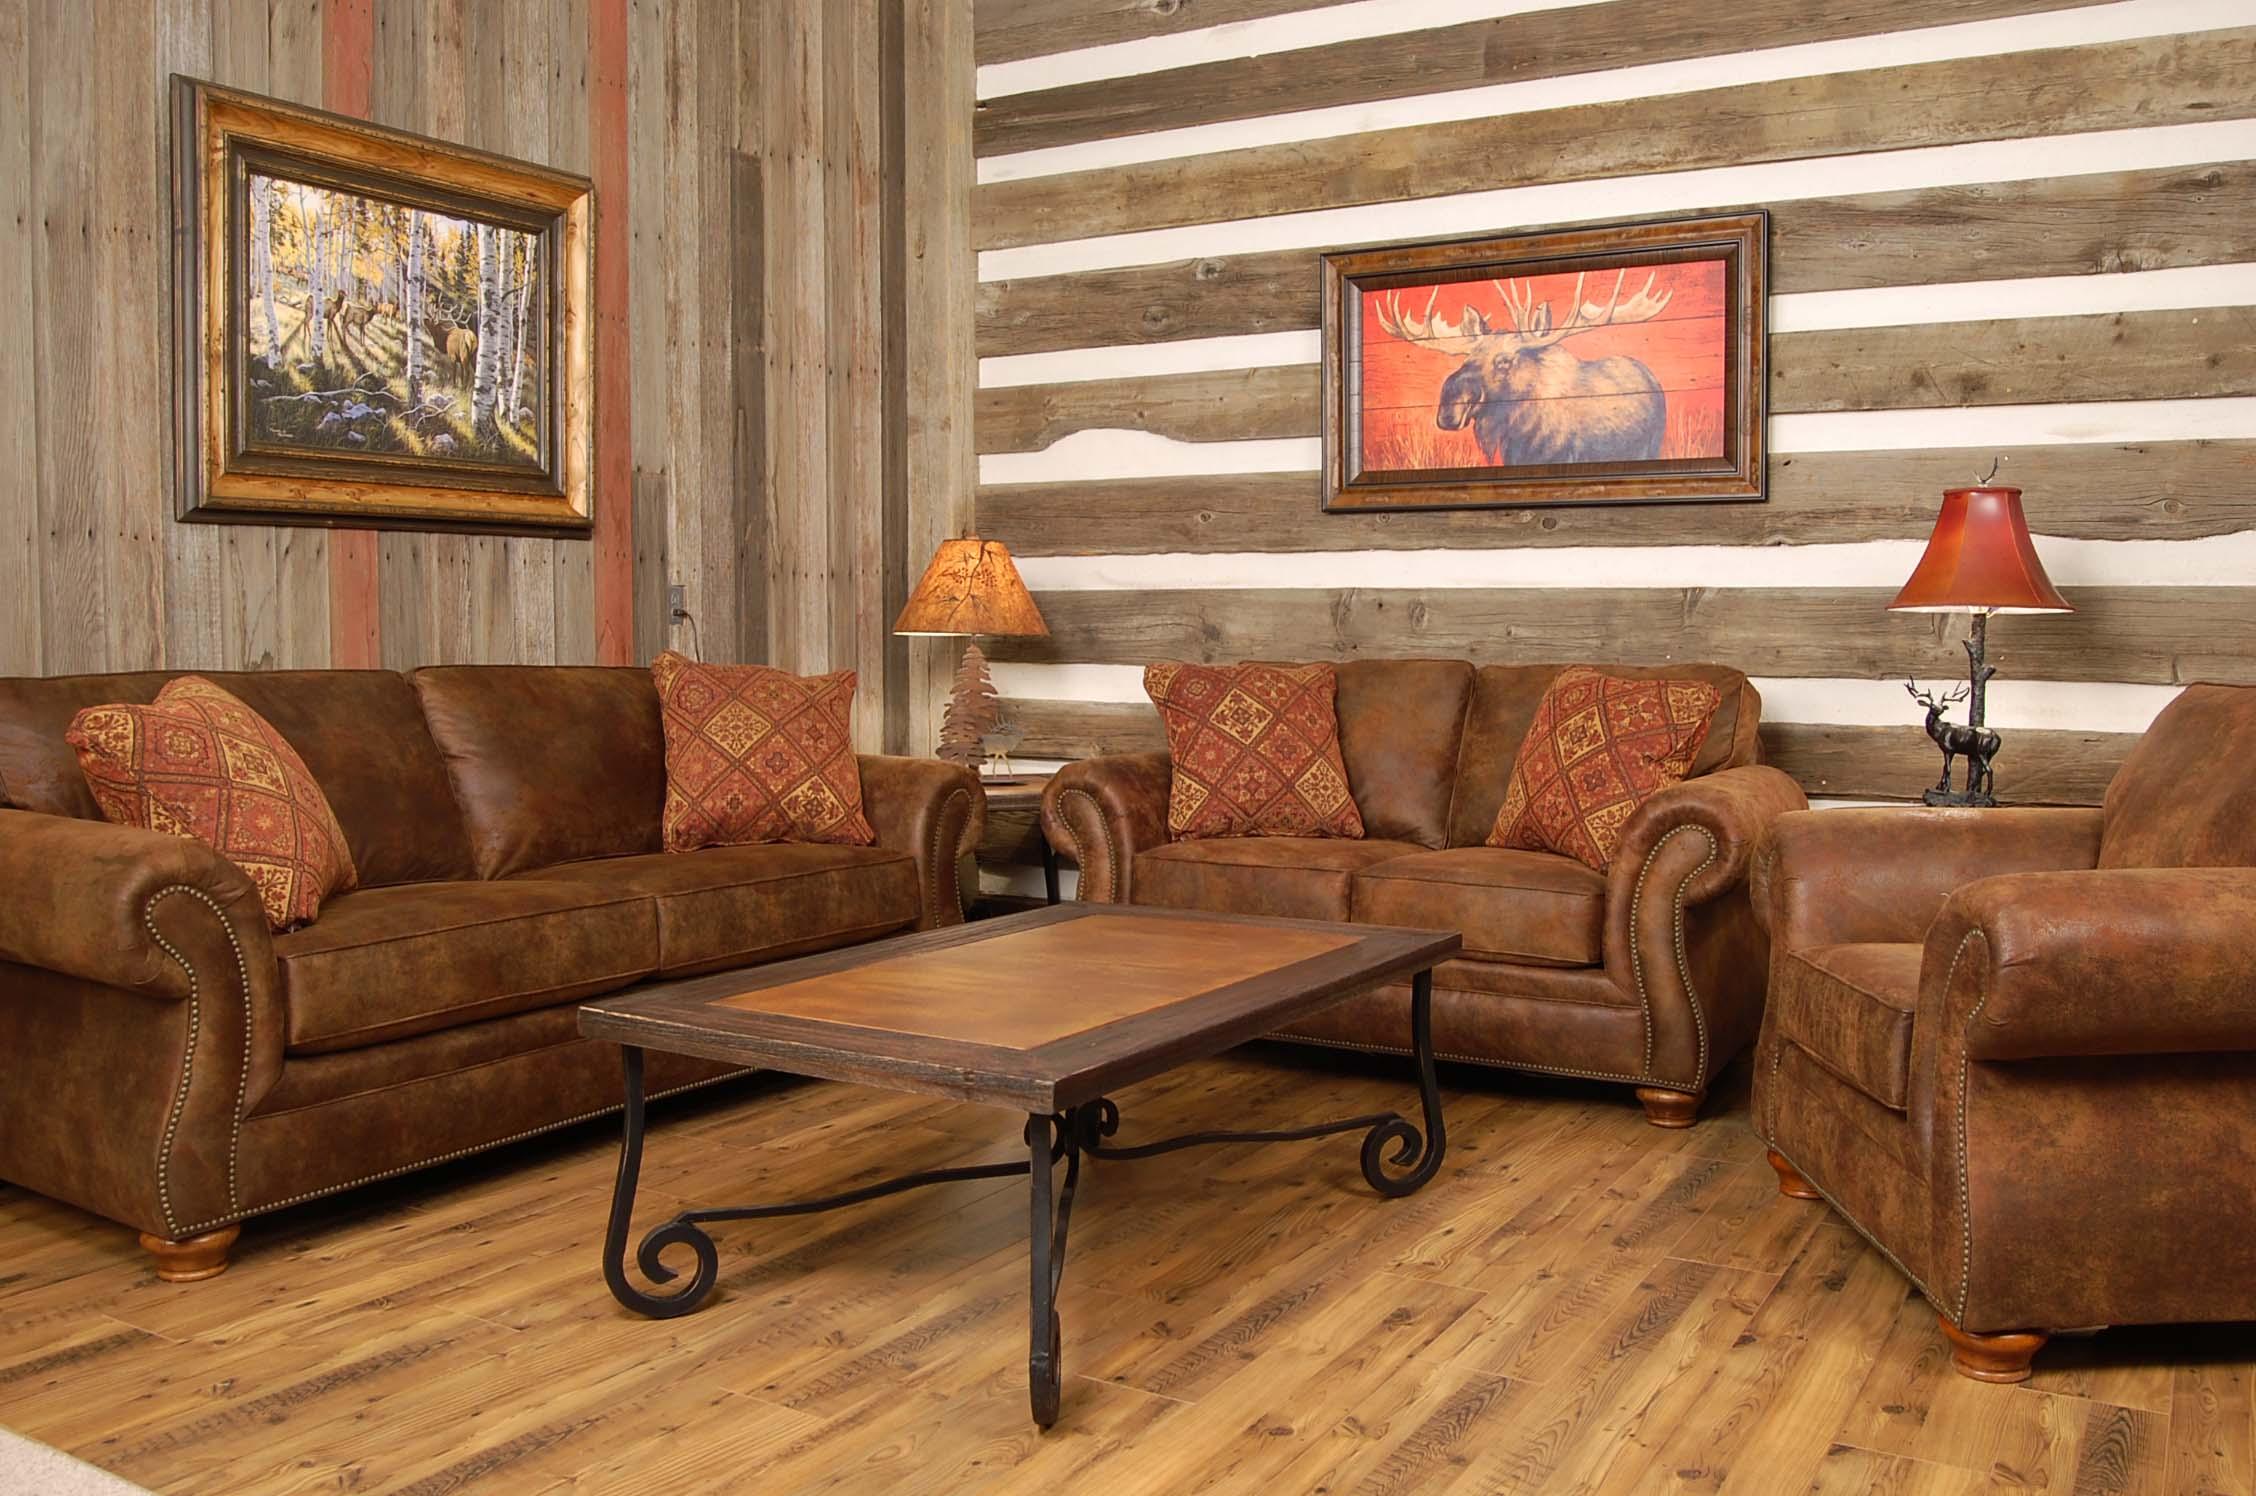 Western Es For Living Rooms Esgram, Western Living Room Design Ideas